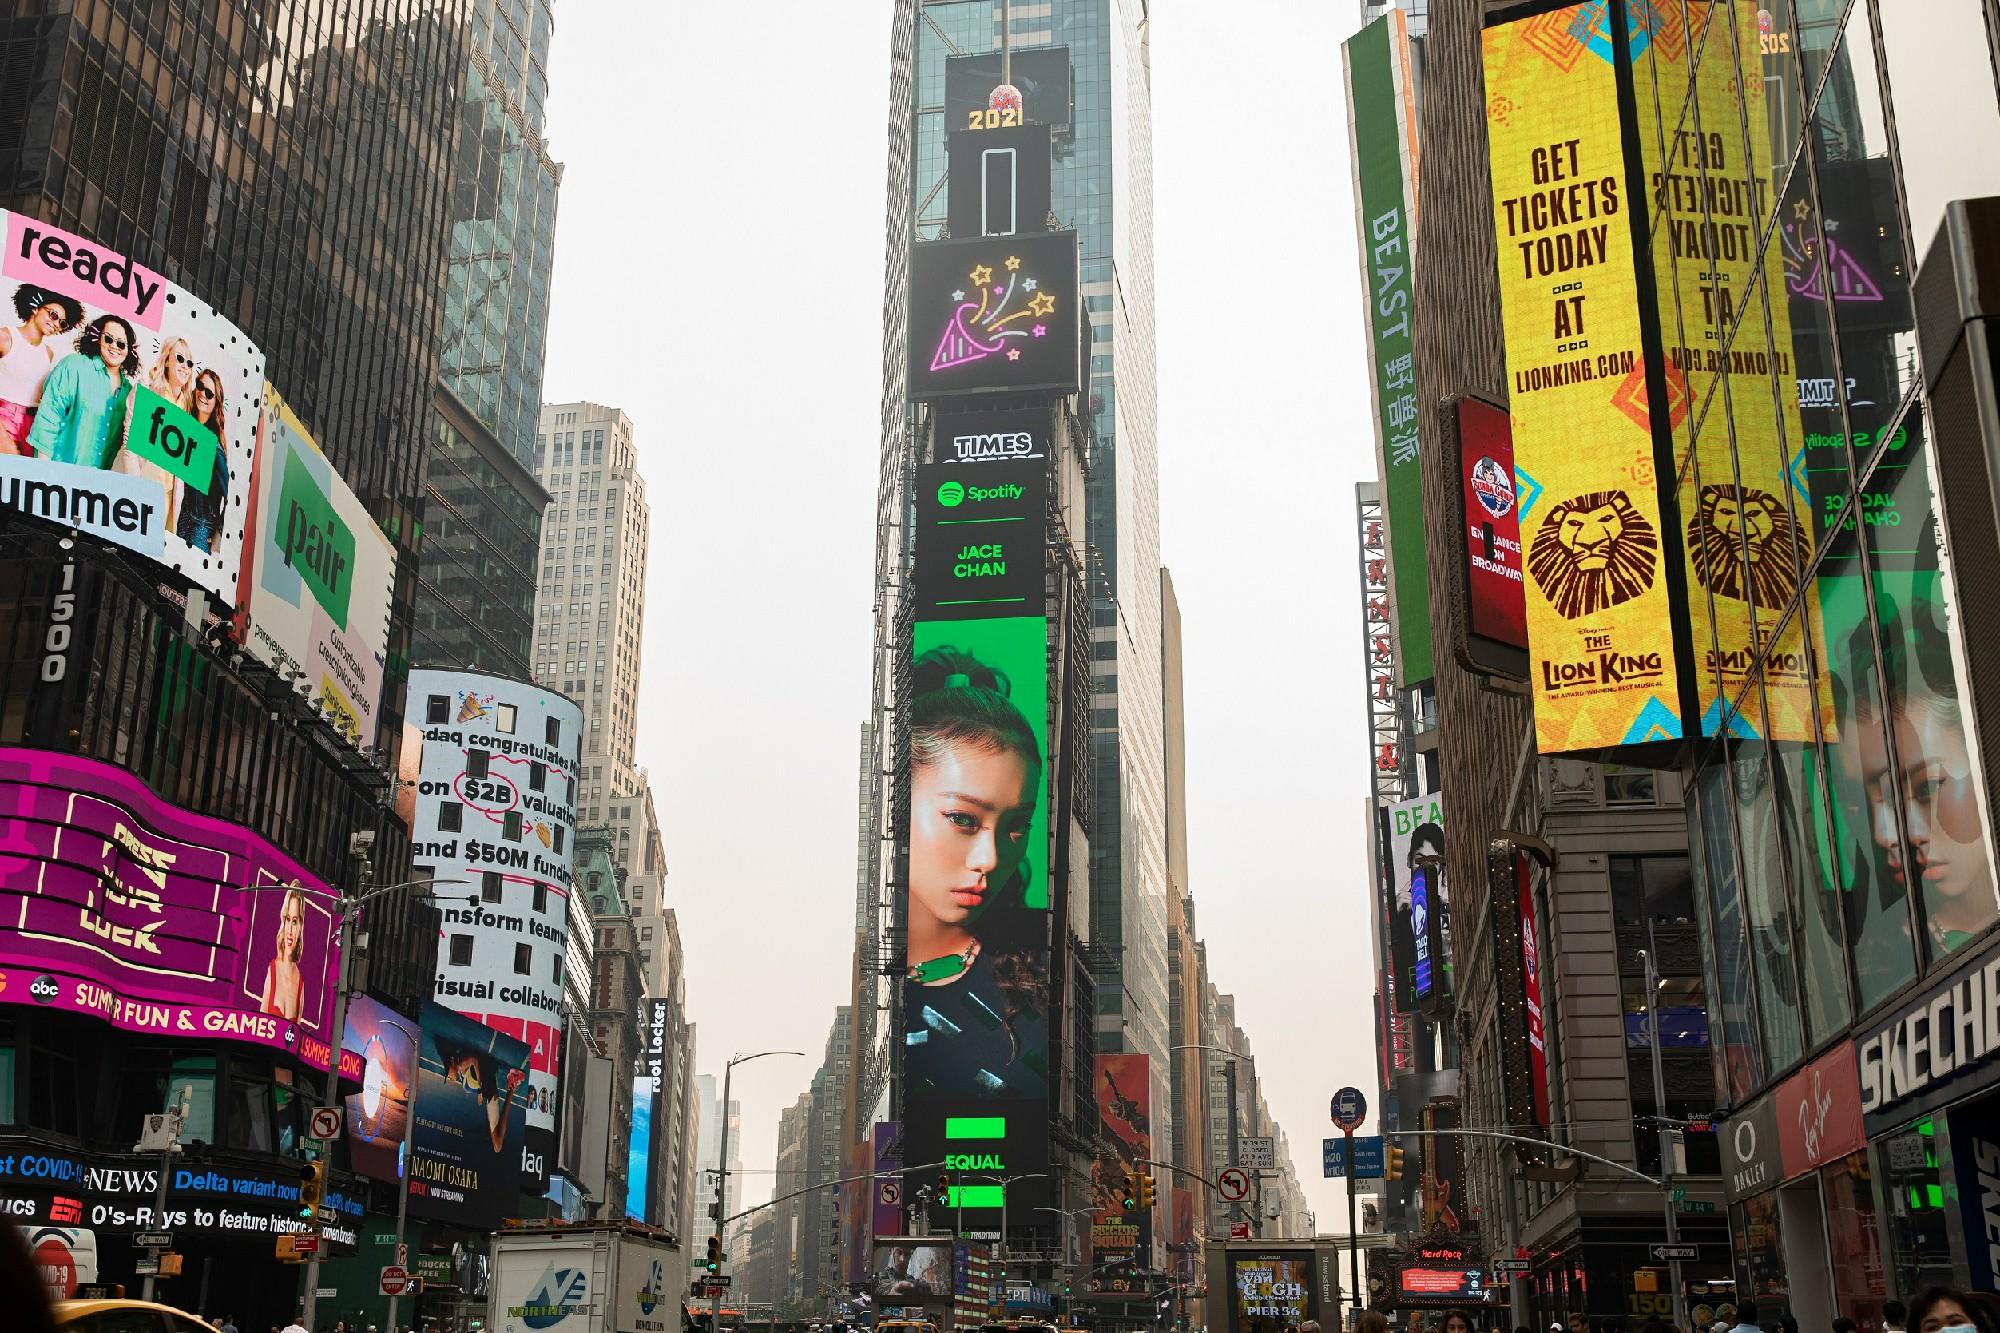 Jace陈凯咏首张专辑获白金认证 登纽约时代广场受全球瞩目